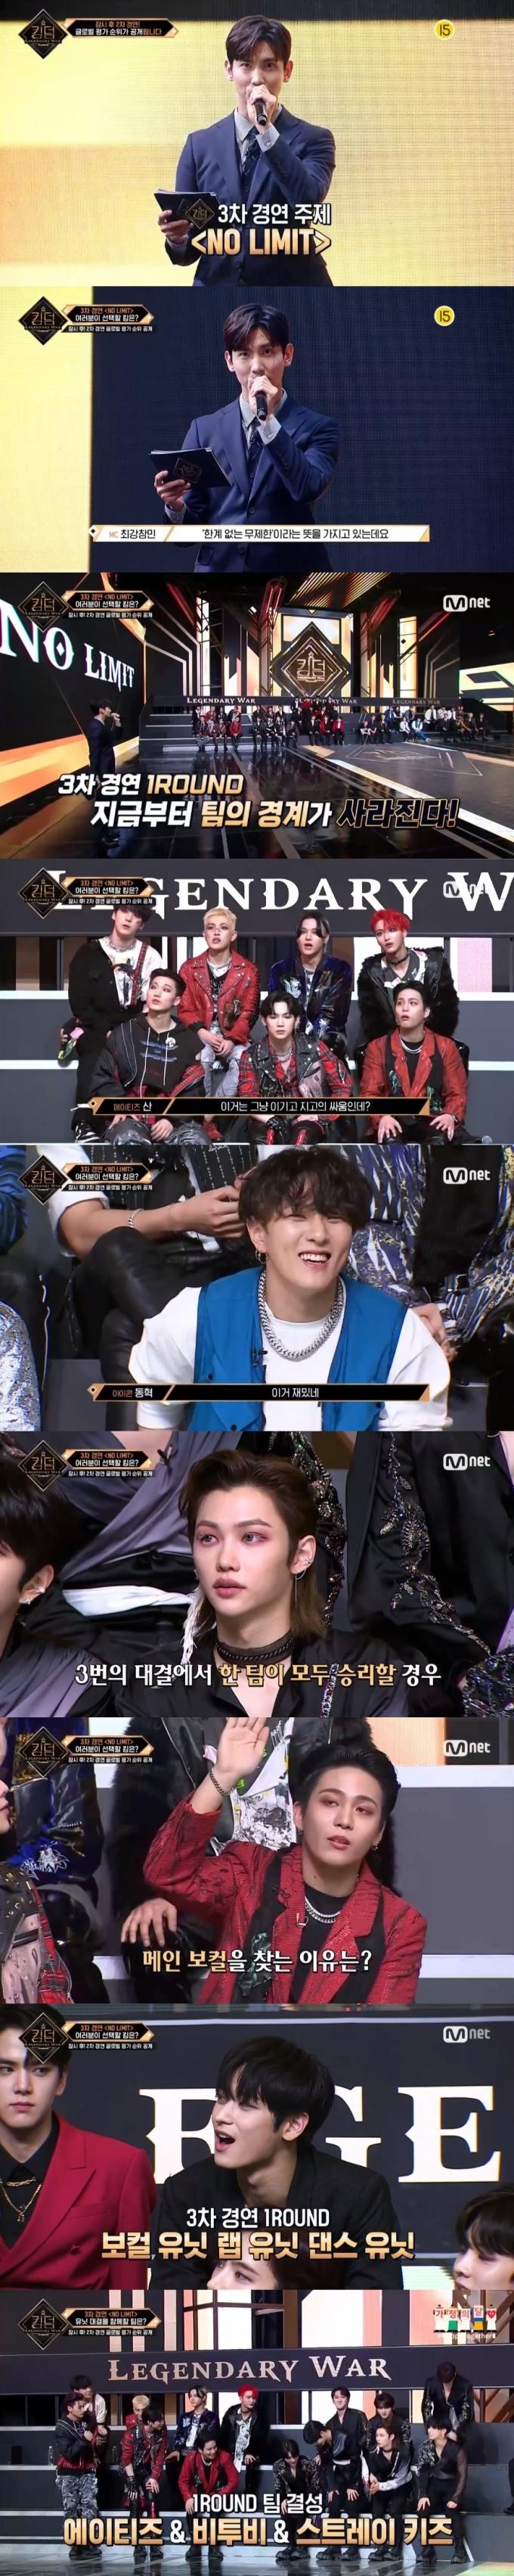 Mnet '킹덤 : 레전더리 워' 캡처 © 뉴스1